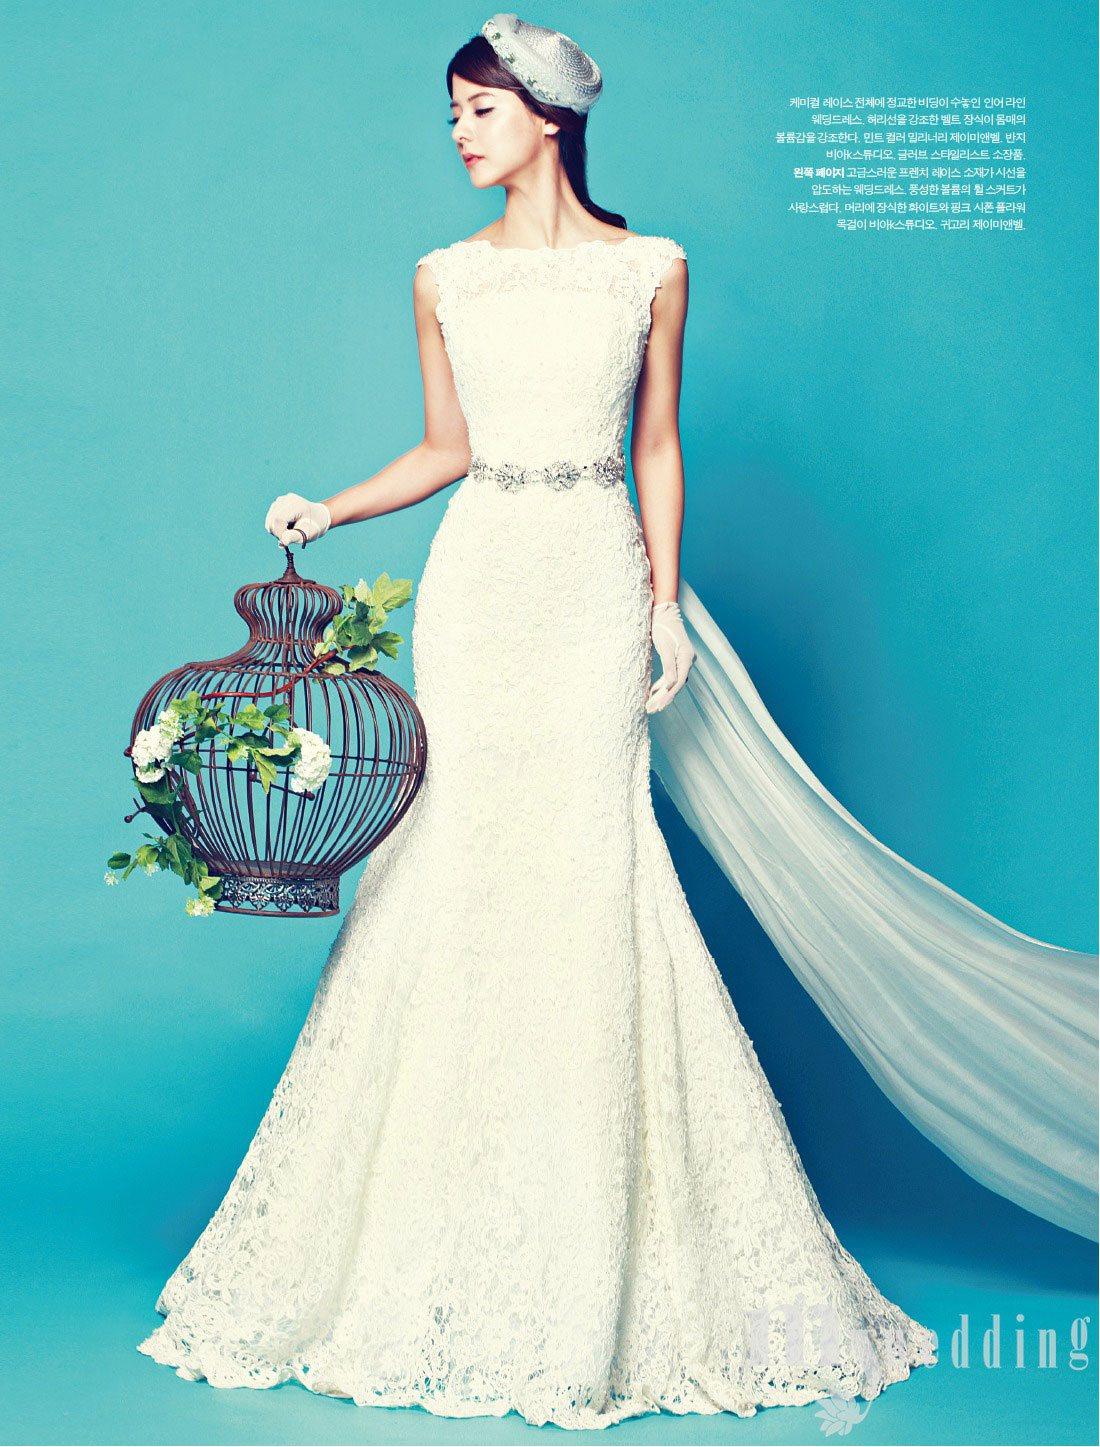 mina-fujii-wedding-magazine-2